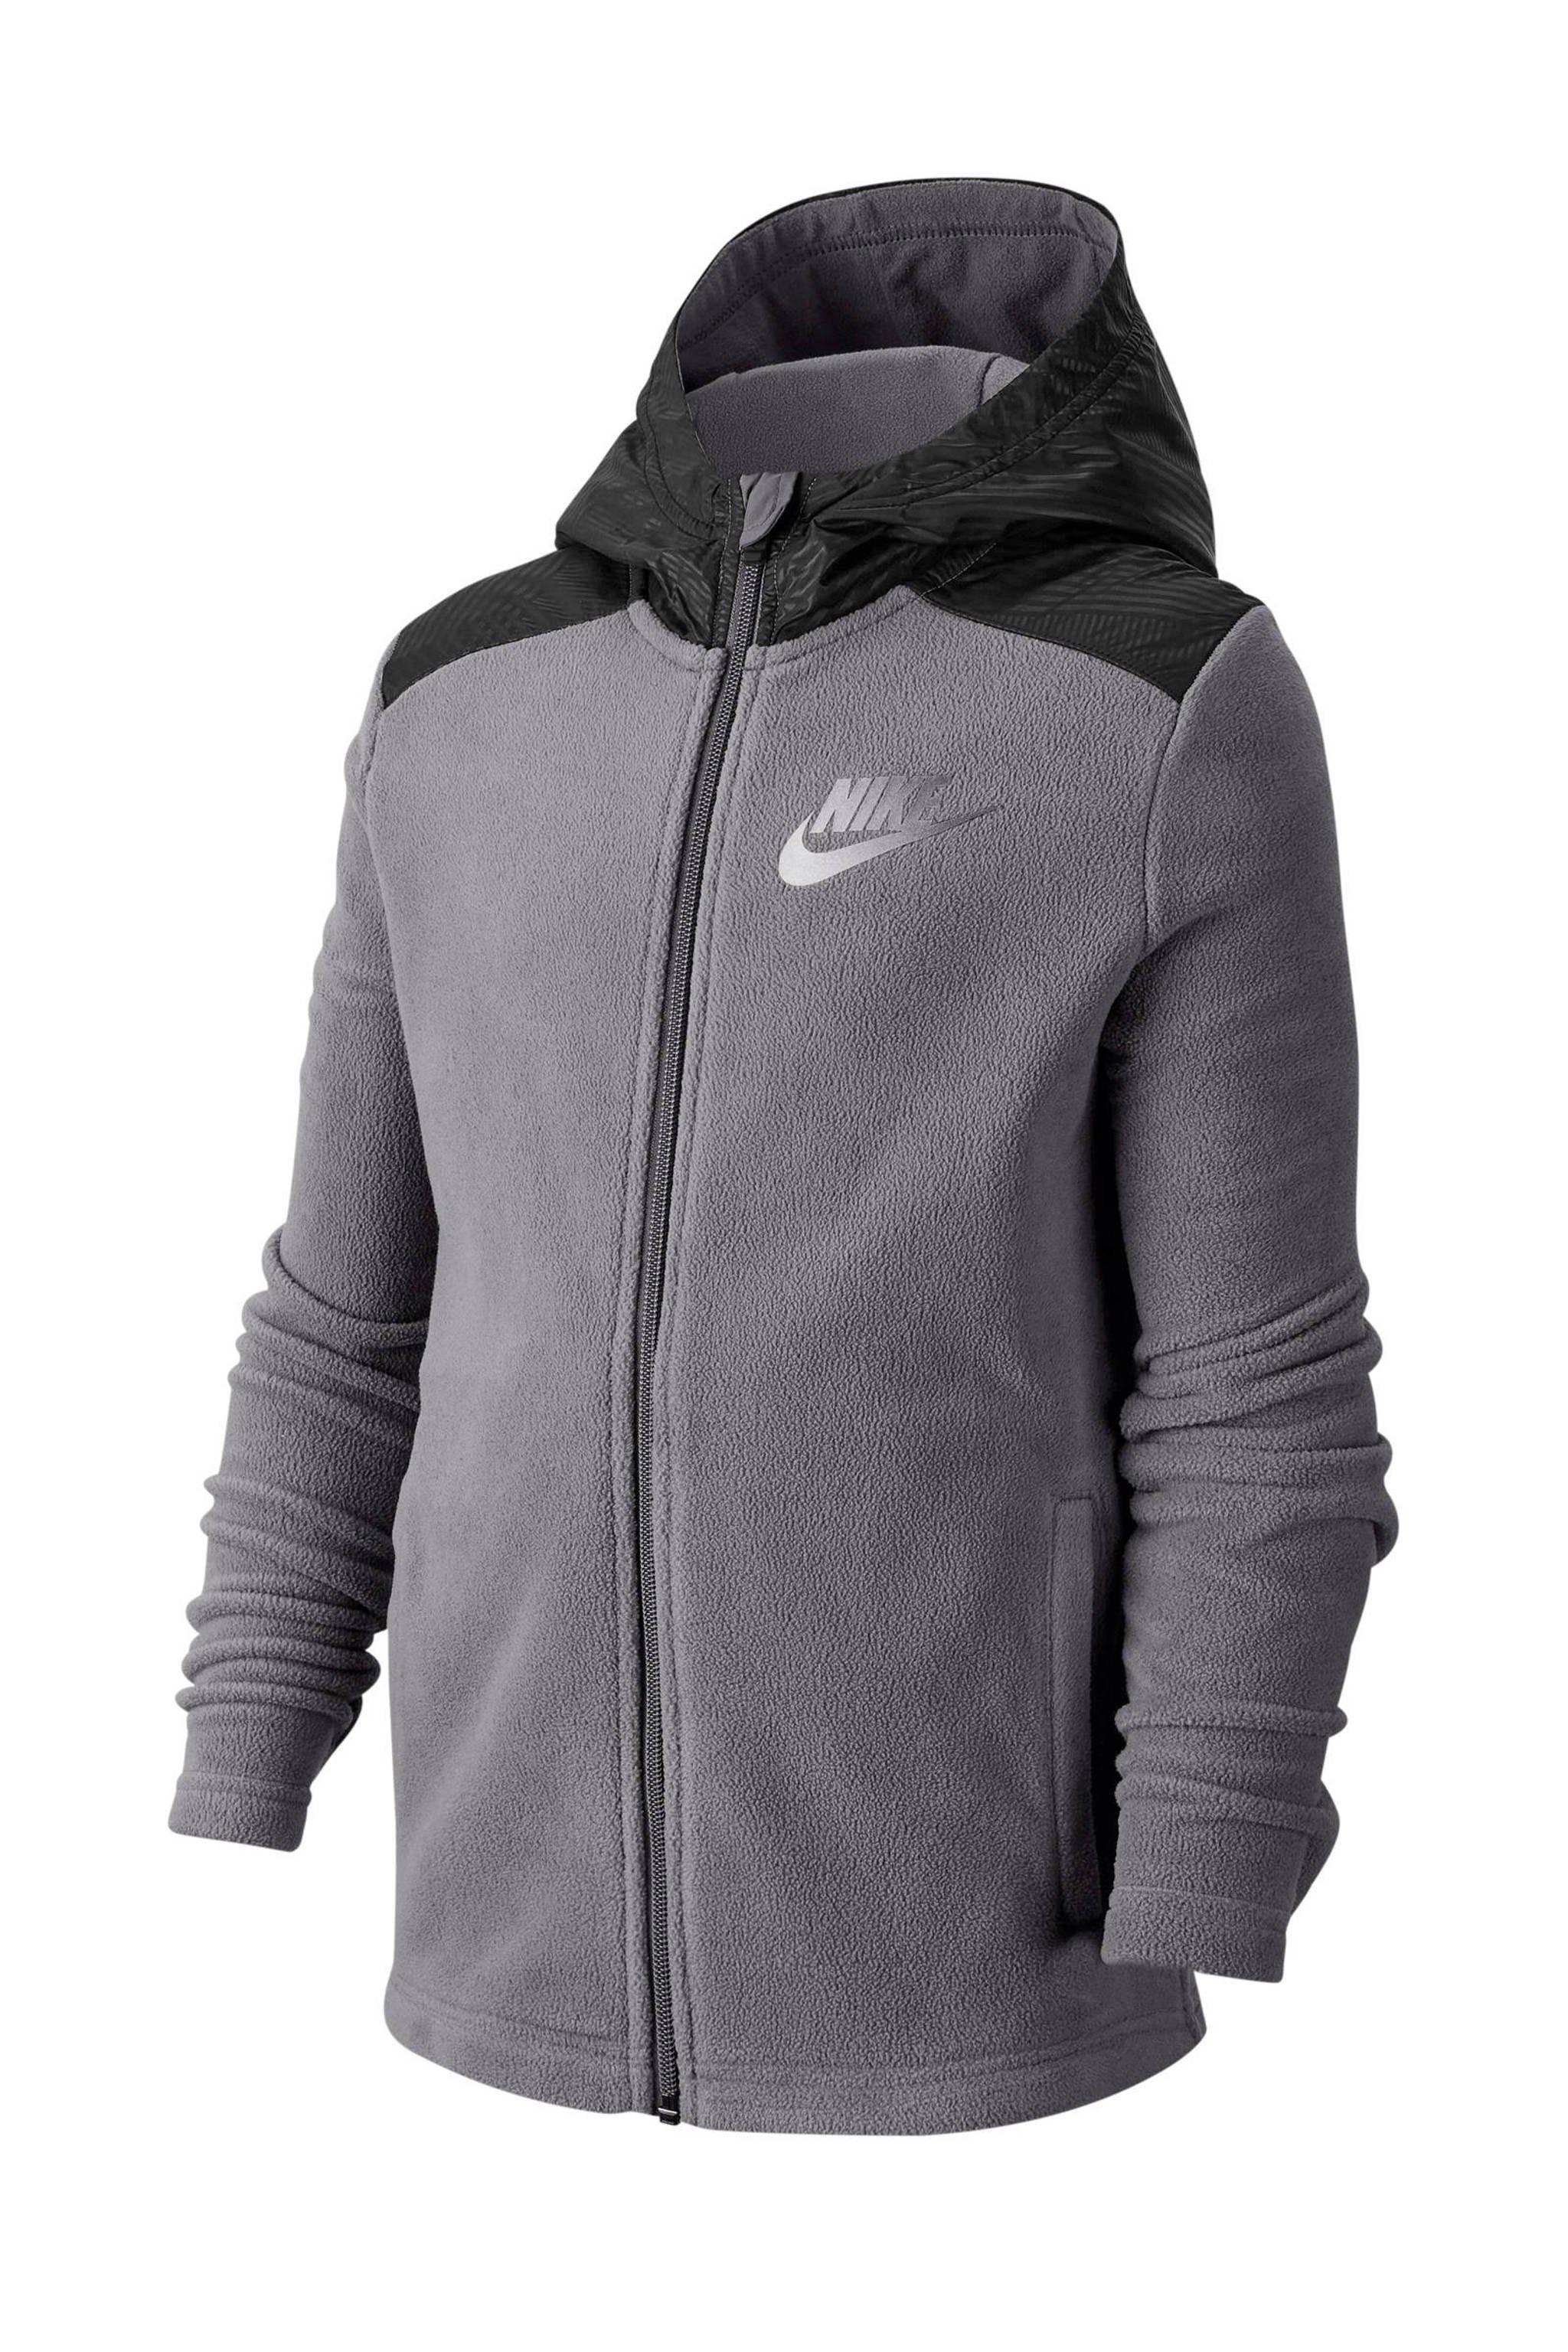 Nike fleece kids hoodie NSW @ Wehkamp